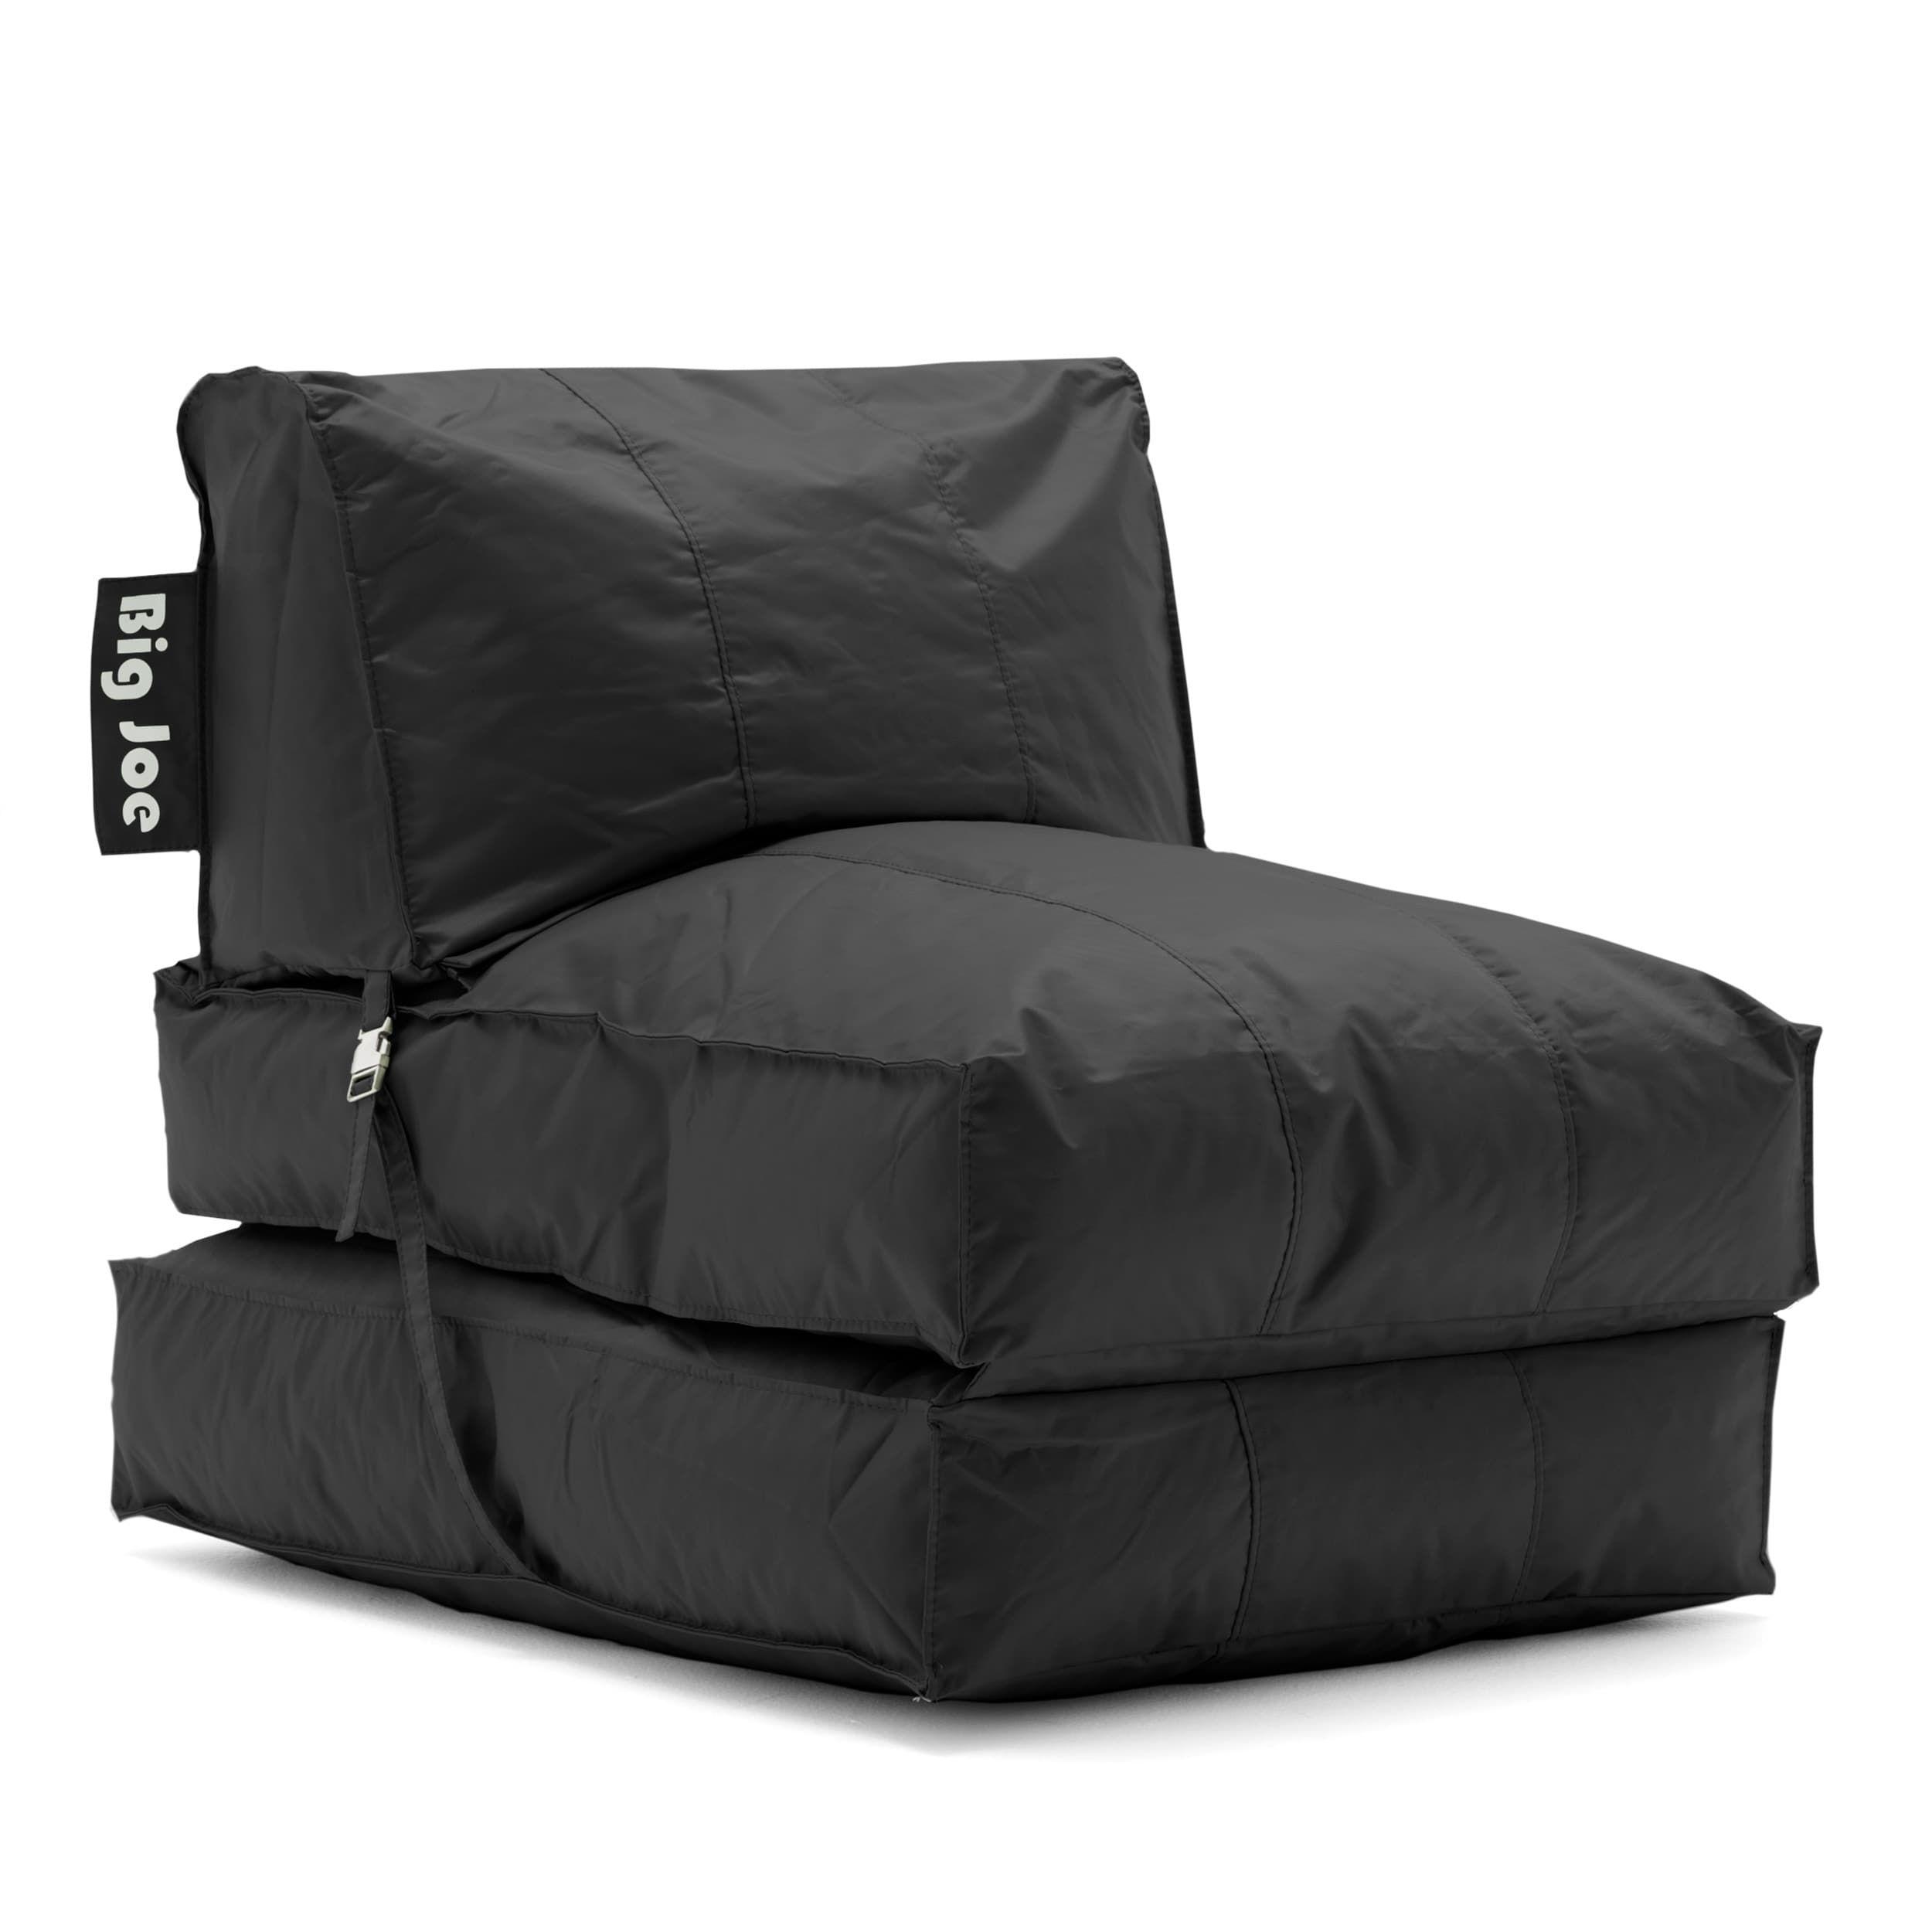 Big Joe Flip Lounger Bean Bag Chair (Green) Bean bag